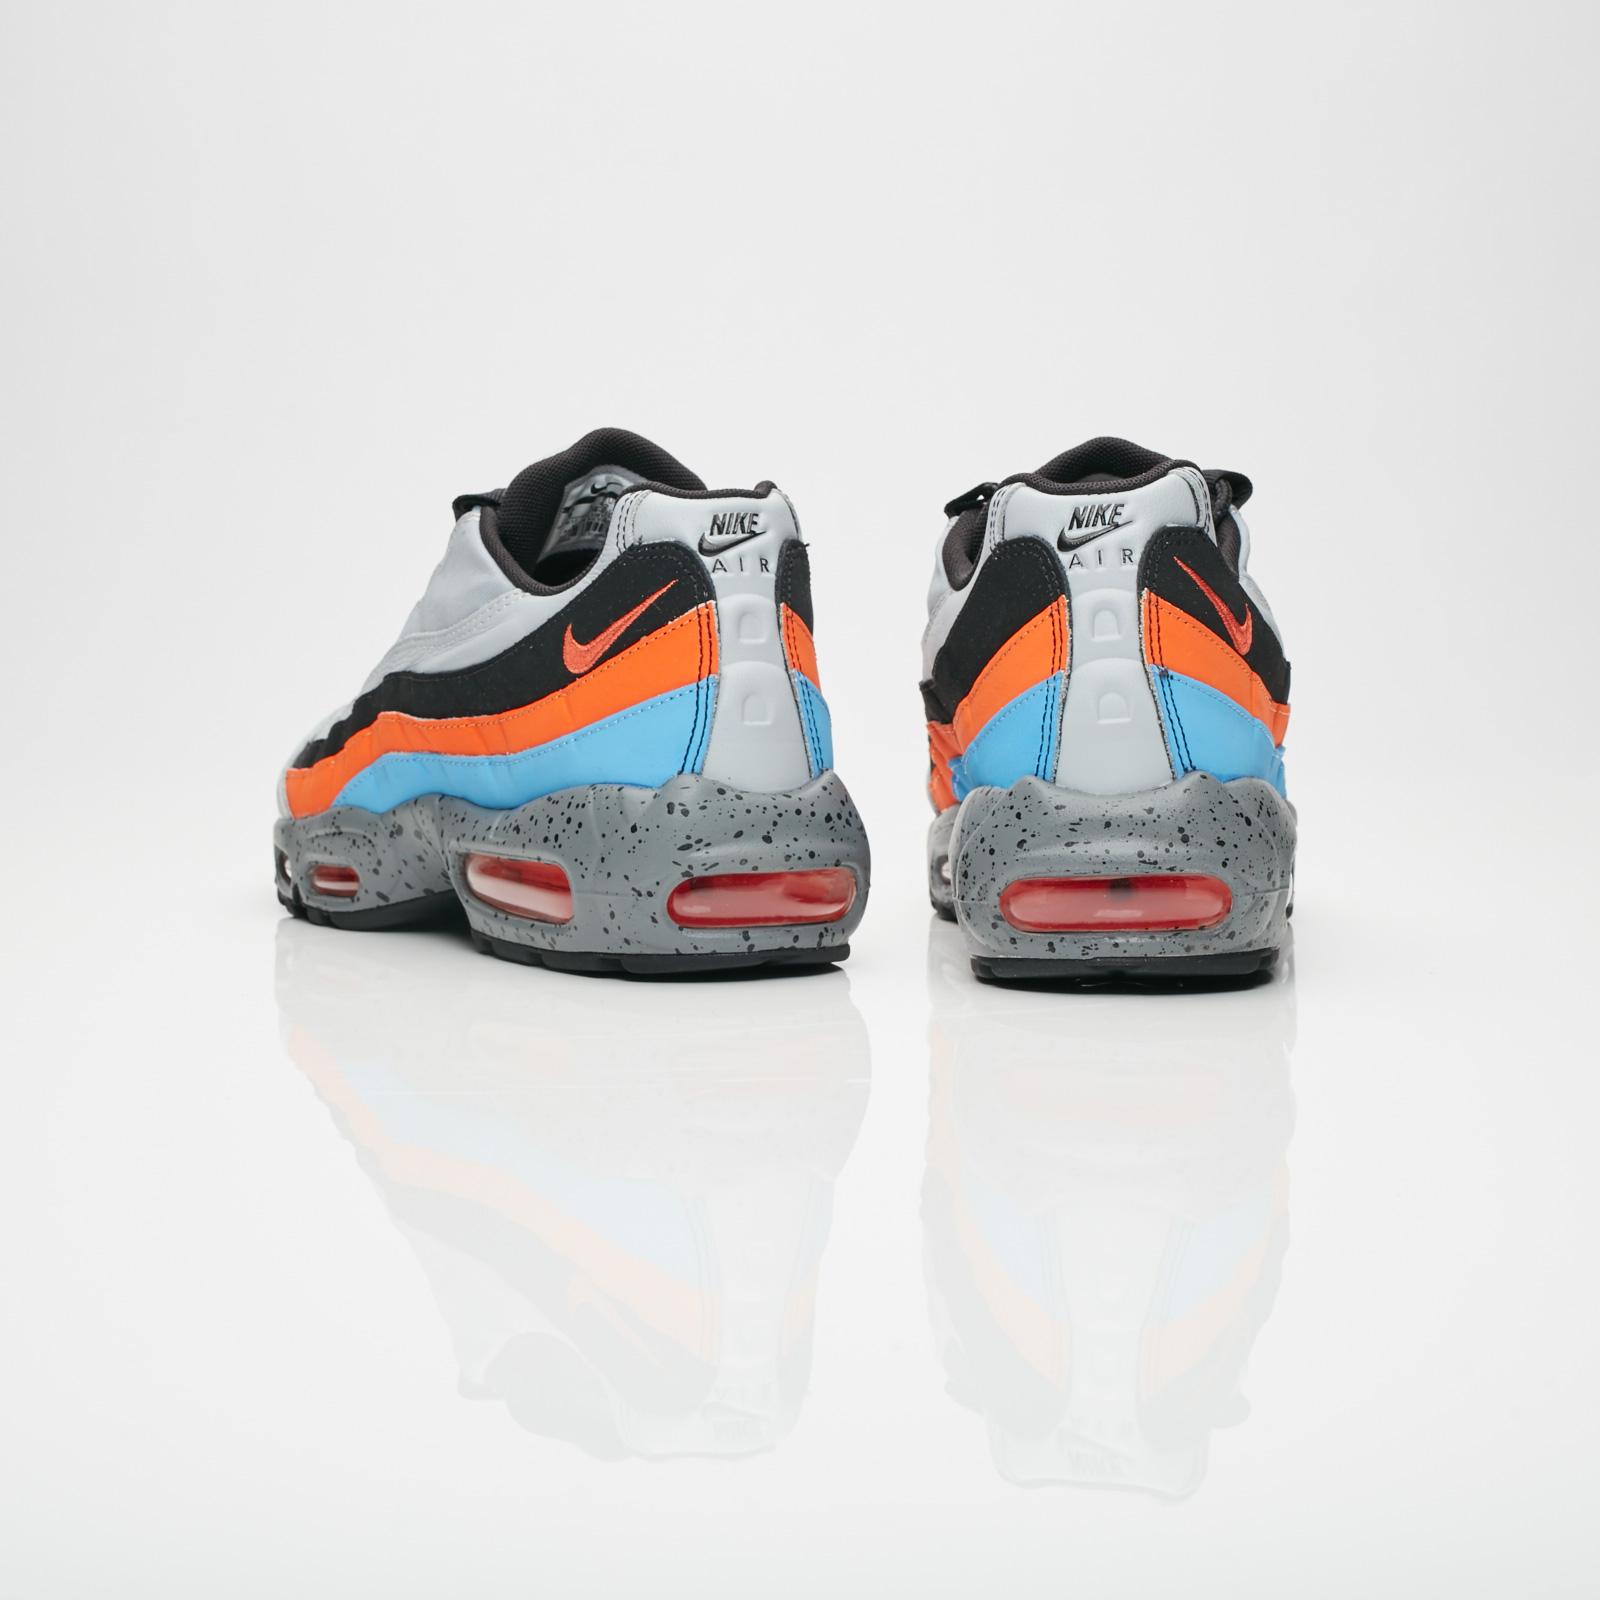 6129ceea310 Nike Sportswear Air Max 95 Premium Nike Sportswear Air Max 95 Premium ...